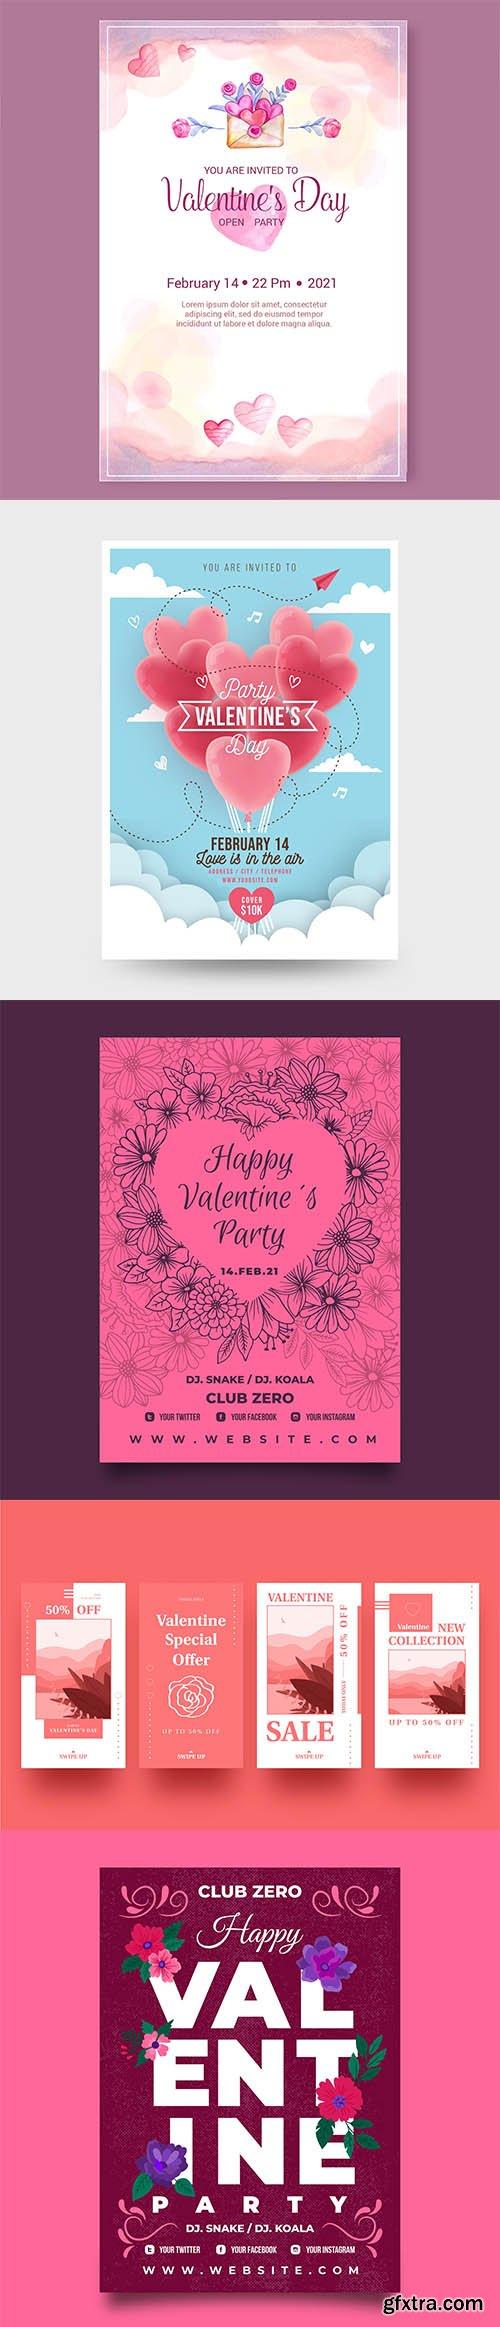 Happy Valentines day vector collection vol 3